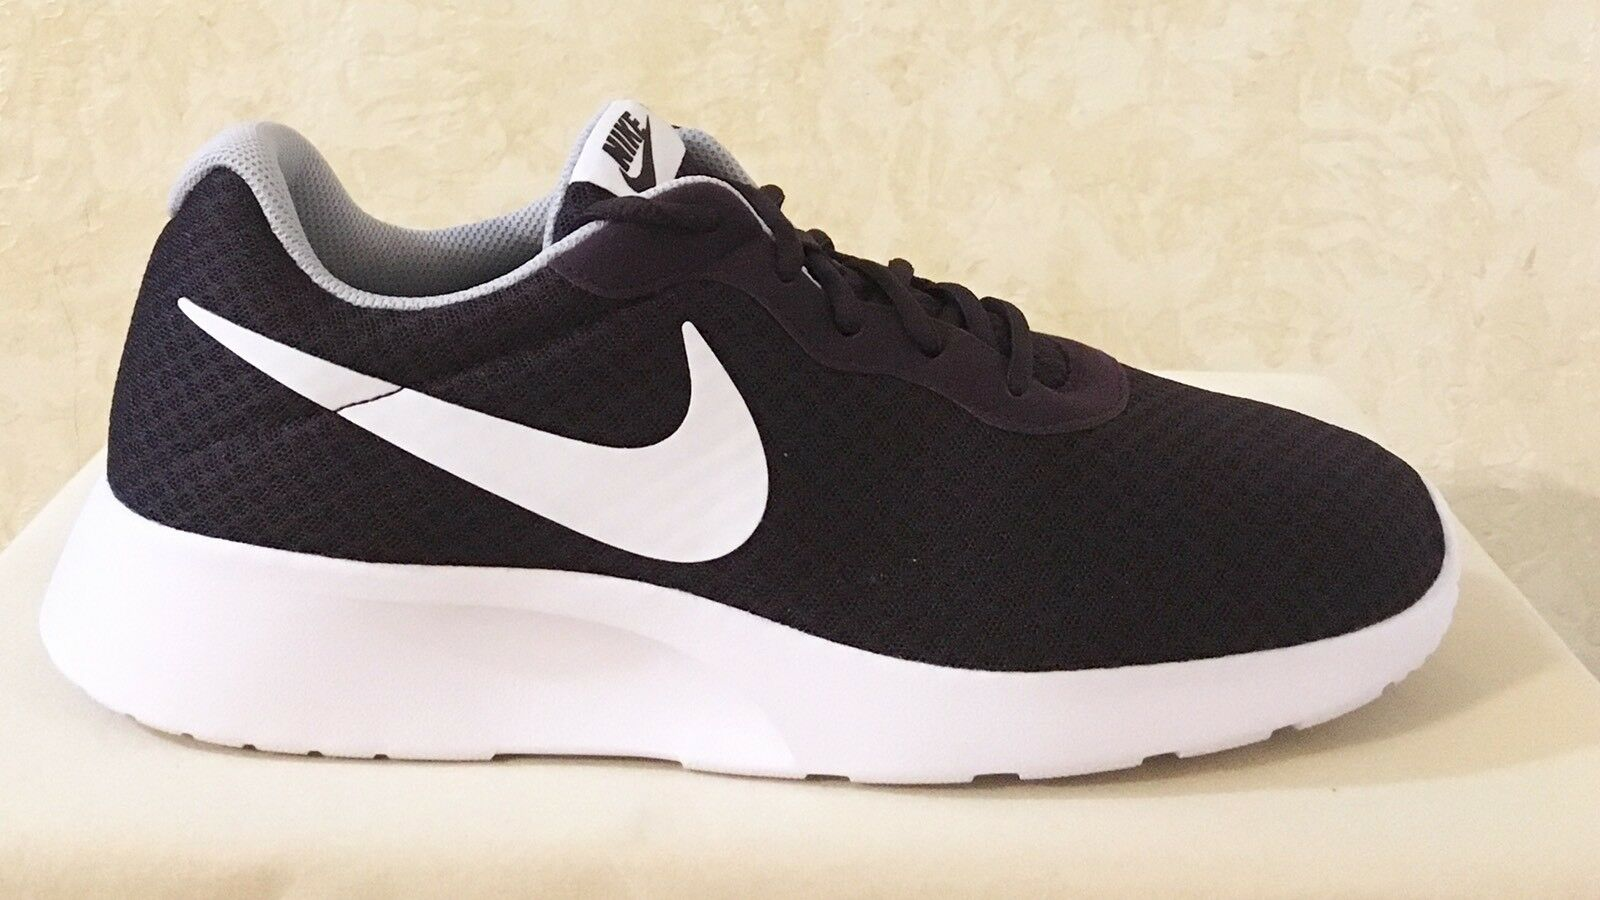 Männer nike tanjun athletic / lifestyle - spitze grau an sneaker portwein / grau spitze 812654-600 6e3343